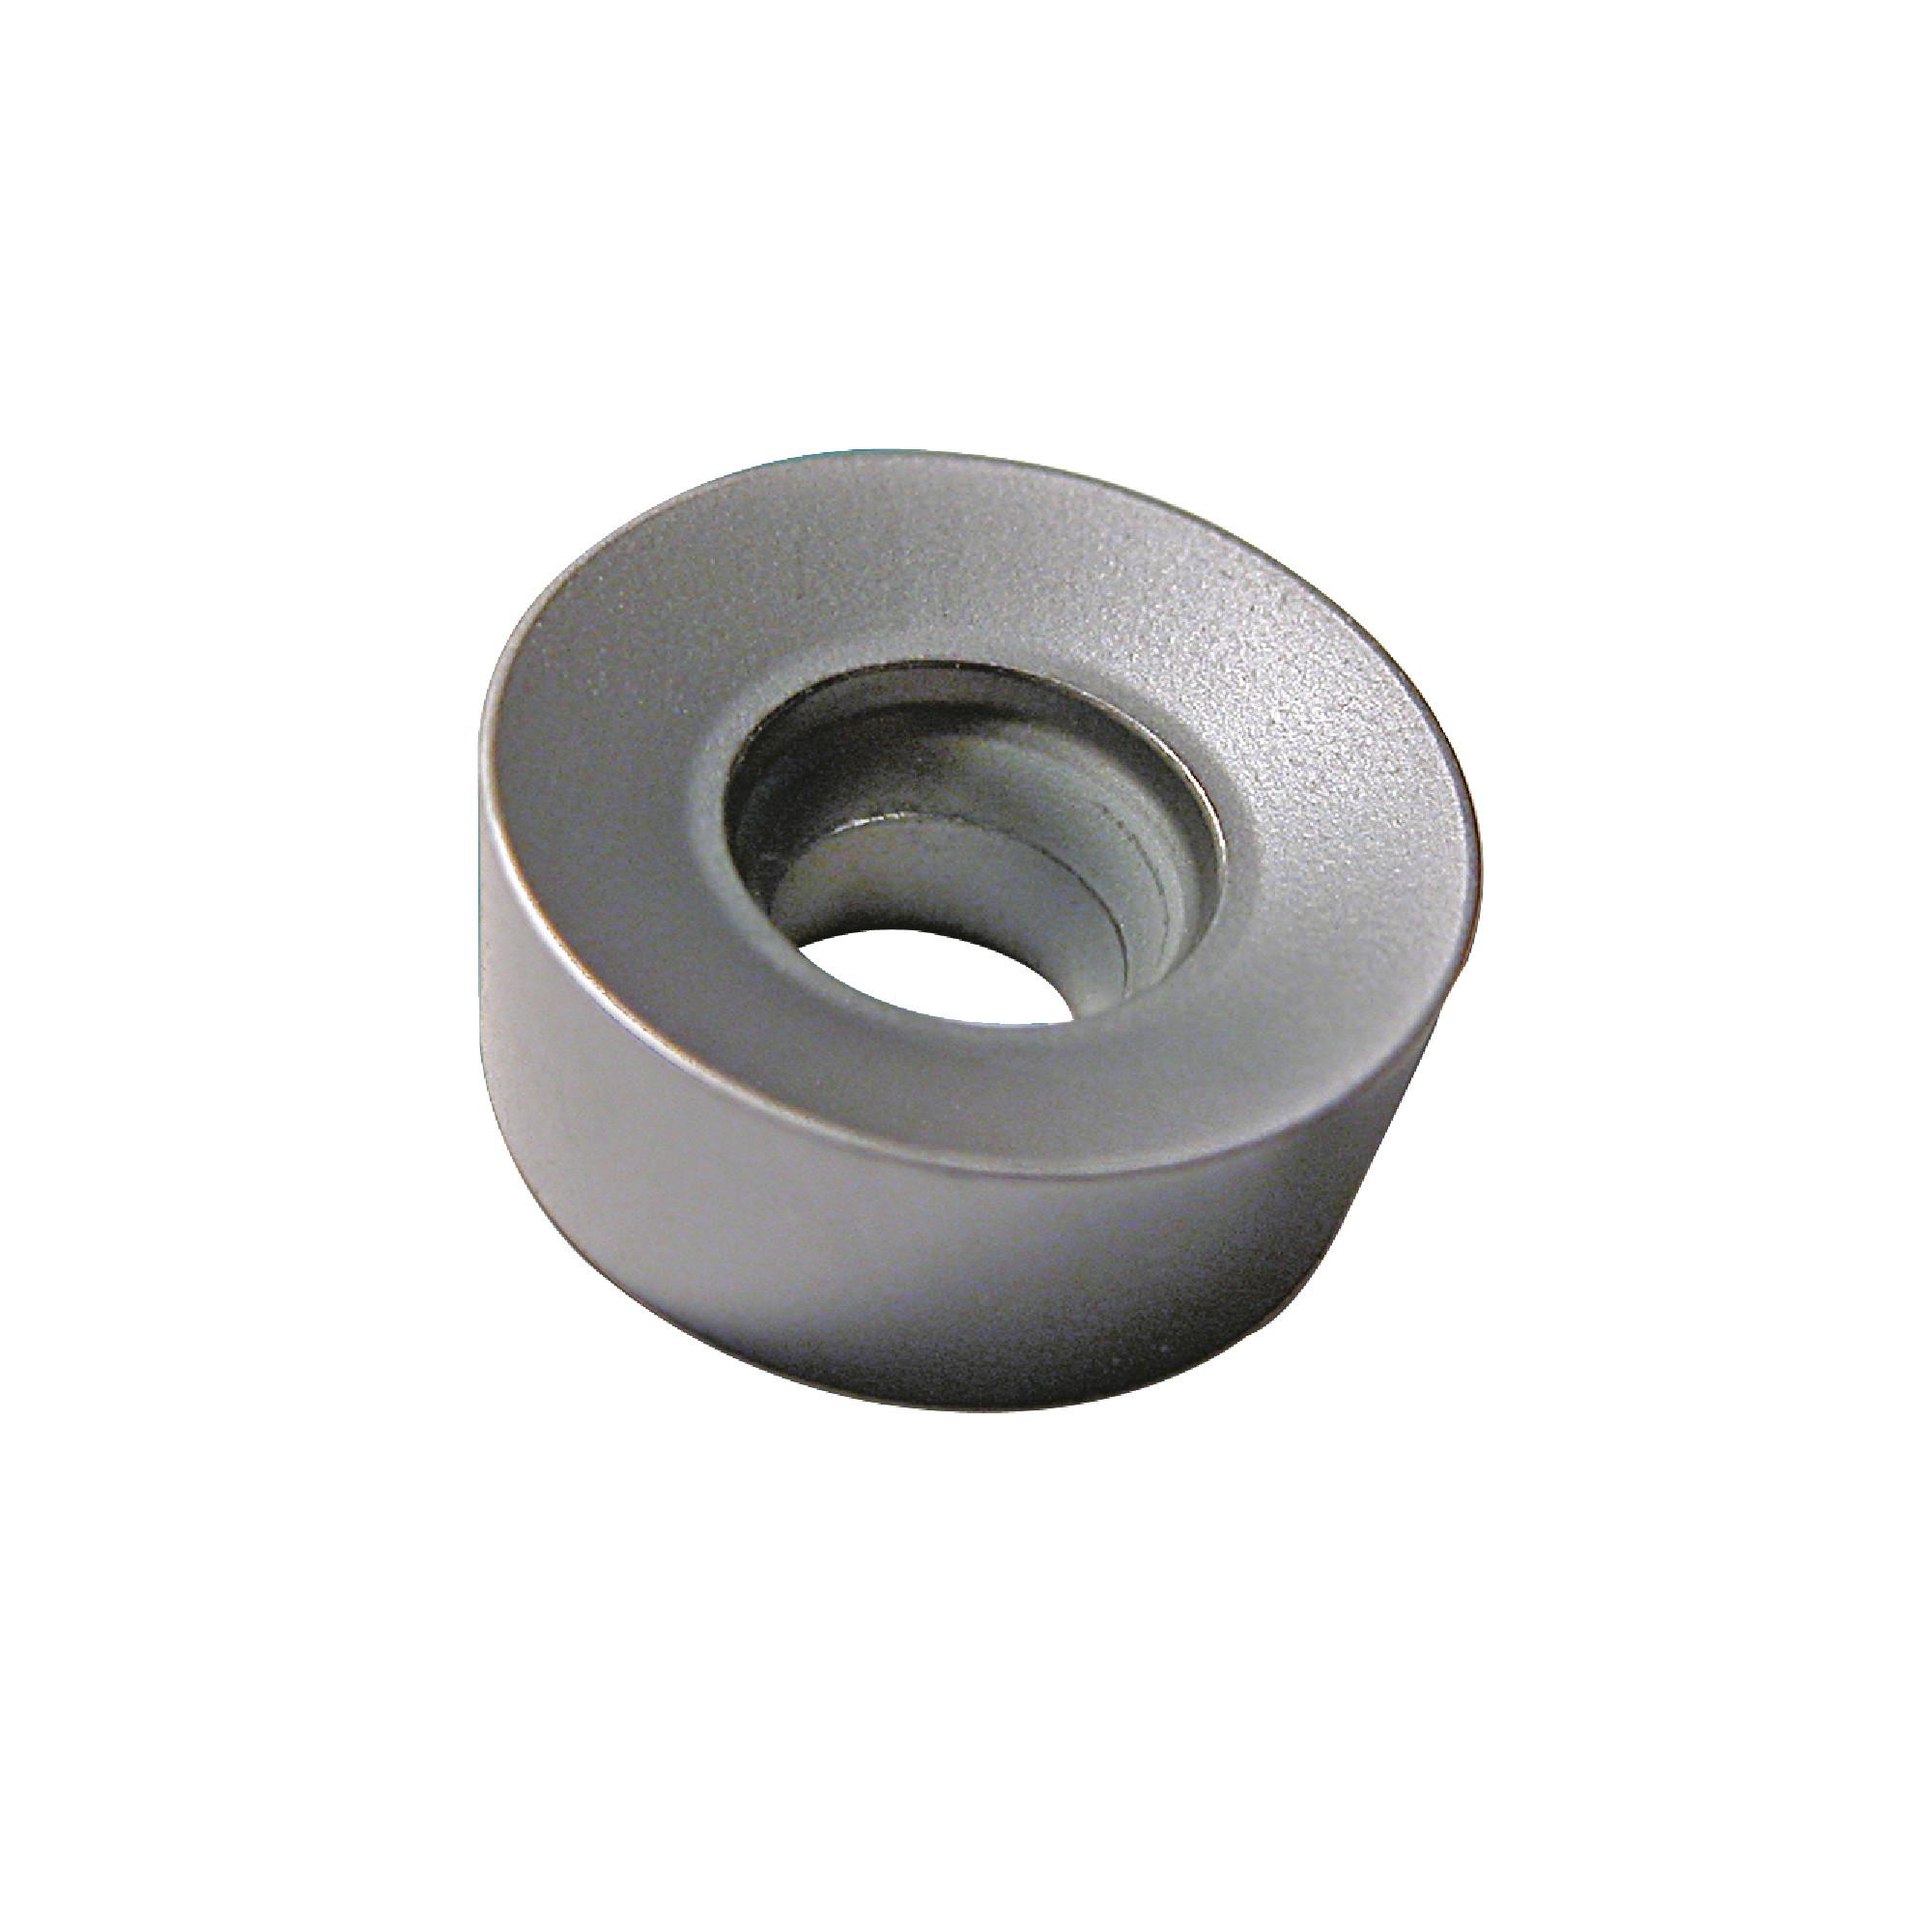 LAMINA - RCMT1204M0 LT10 - Round / Indexable Carbide Turning Insert